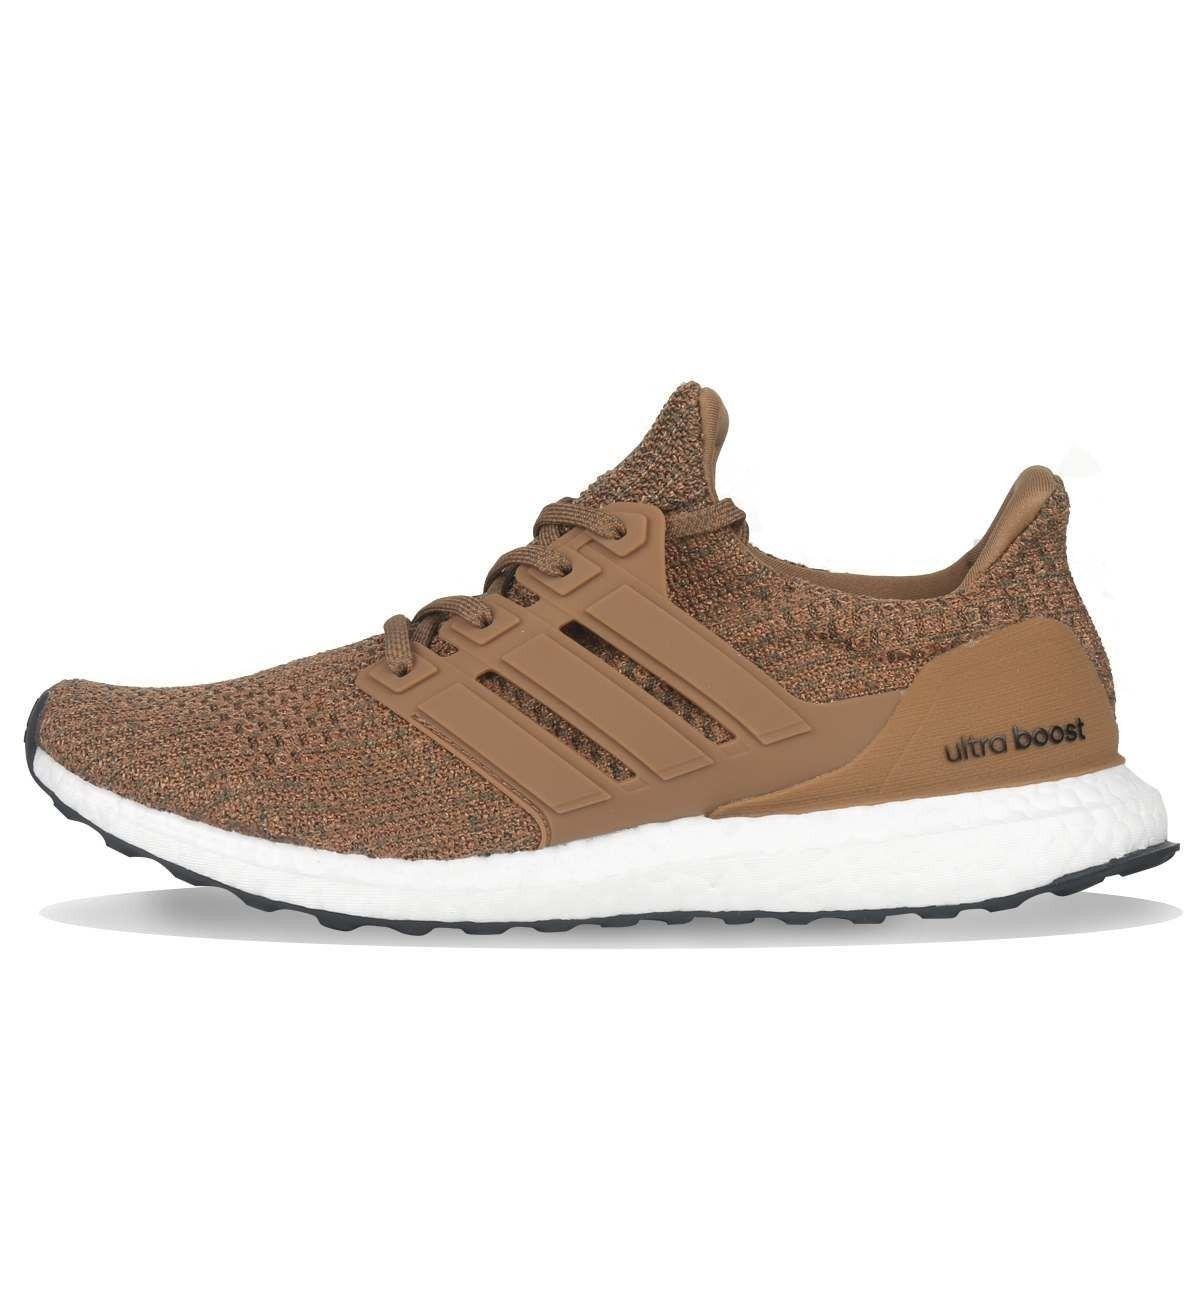 acf628cec521 Adidas UltraBoost Raw Desert £67.99   5 Pointz